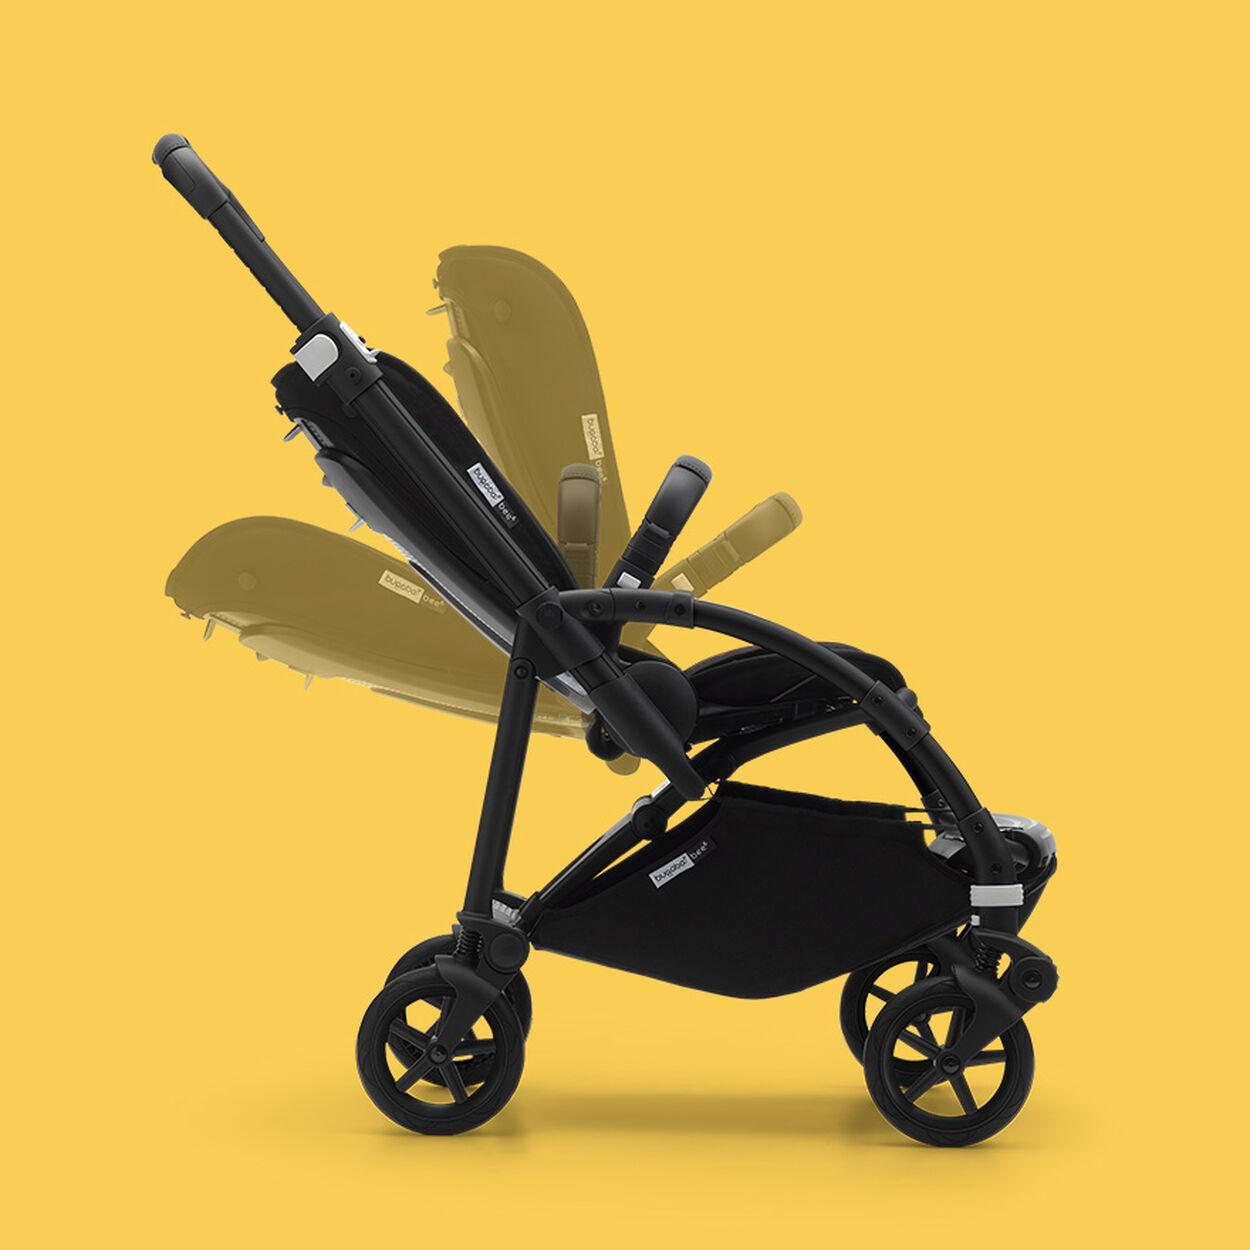 Bugaboo Bee reclinable seat